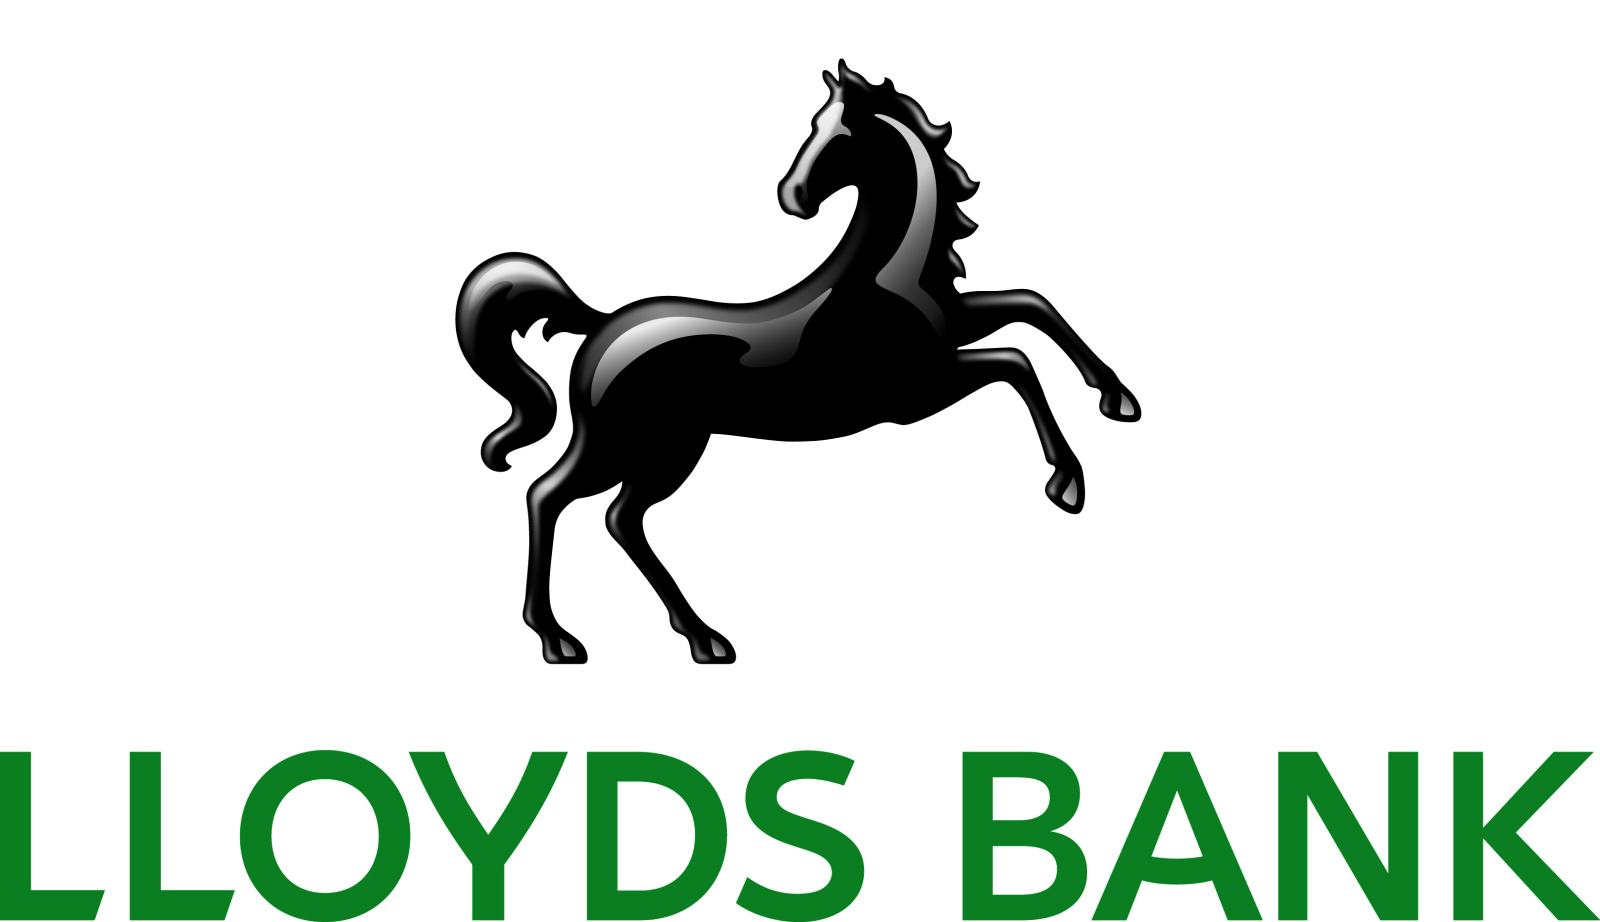 JP Morgan, Lloyds Bank express interest in buying Starling Bank